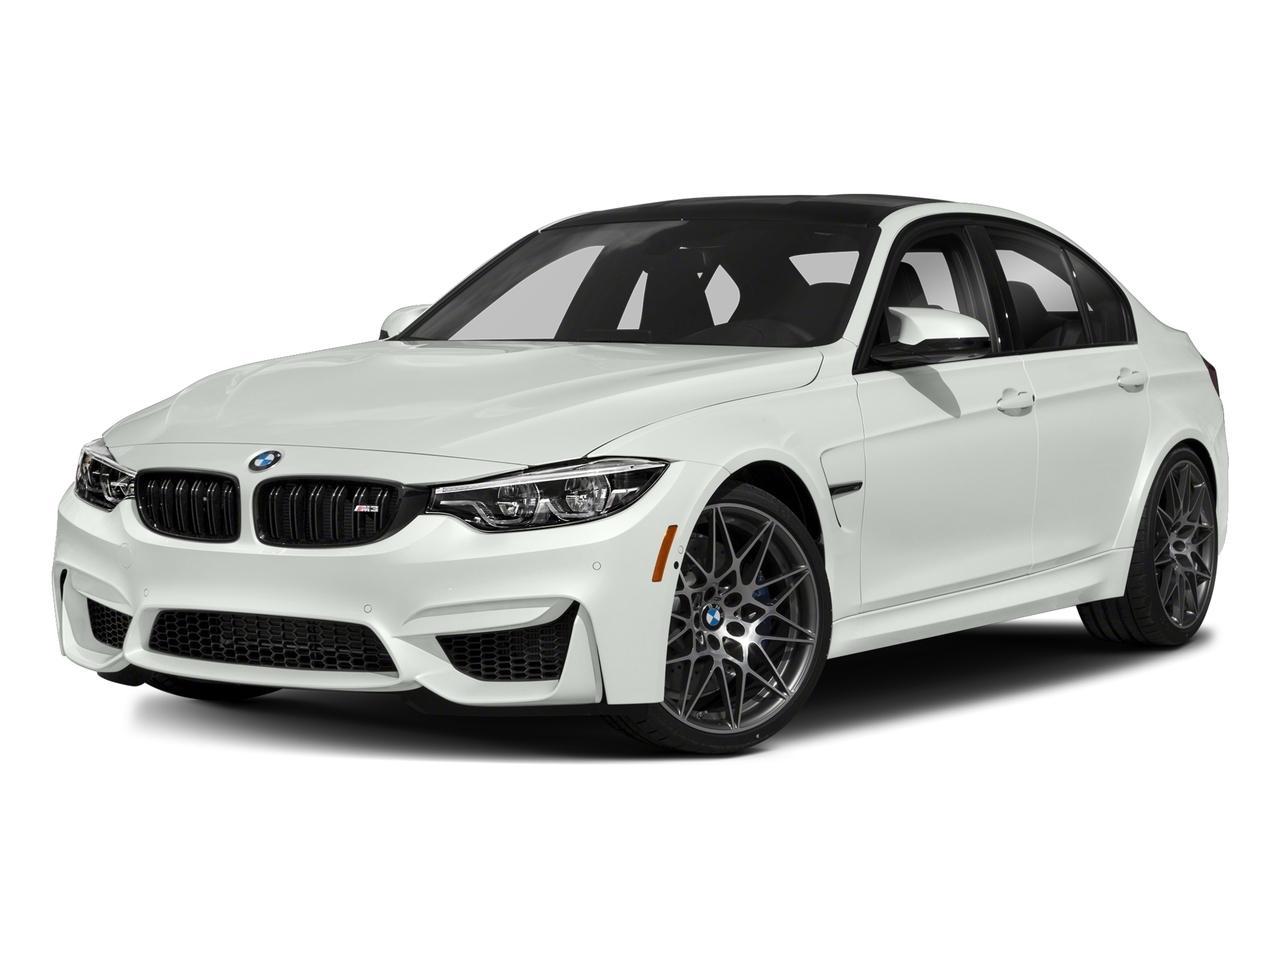 2018 BMW M3 Vehicle Photo in Pleasanton, CA 94588